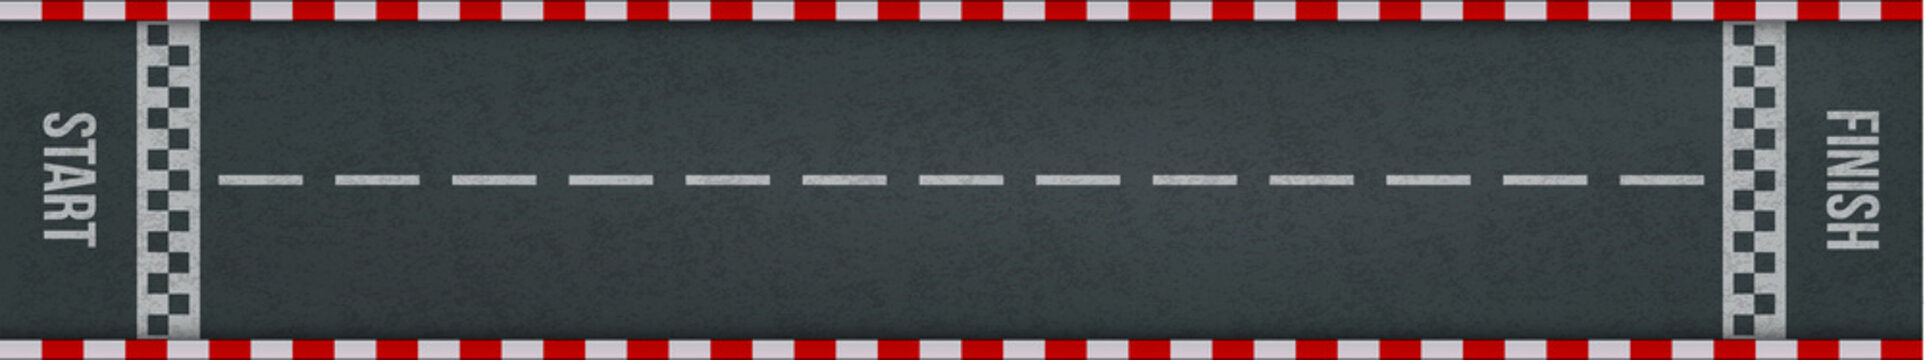 Car racing rally start finish track road marking